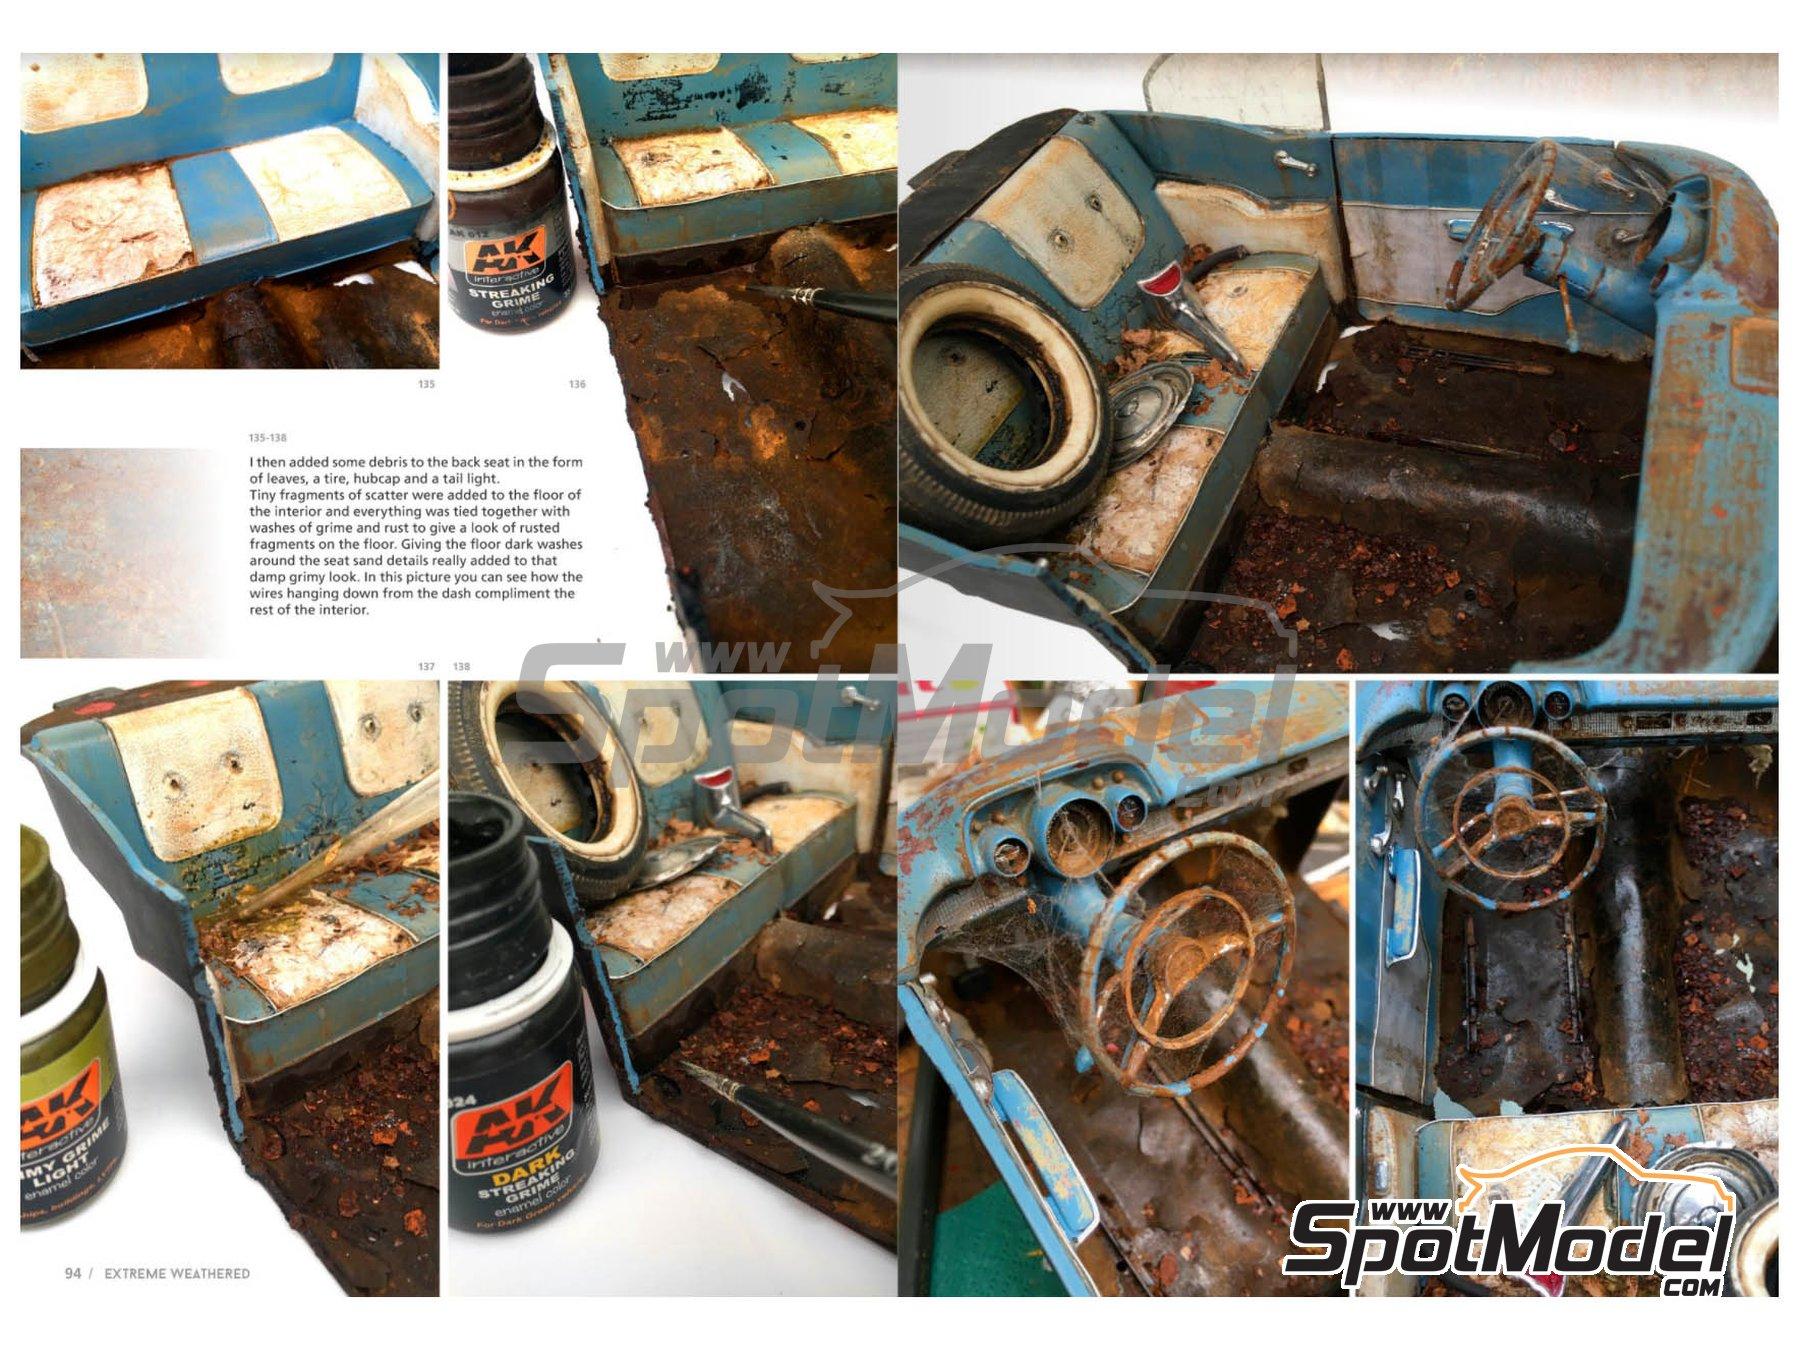 Image 4: Extreme Reality 3 - Vehiculos y entornos degradados | Book manufactured by AK Interactive (ref.AK-509)